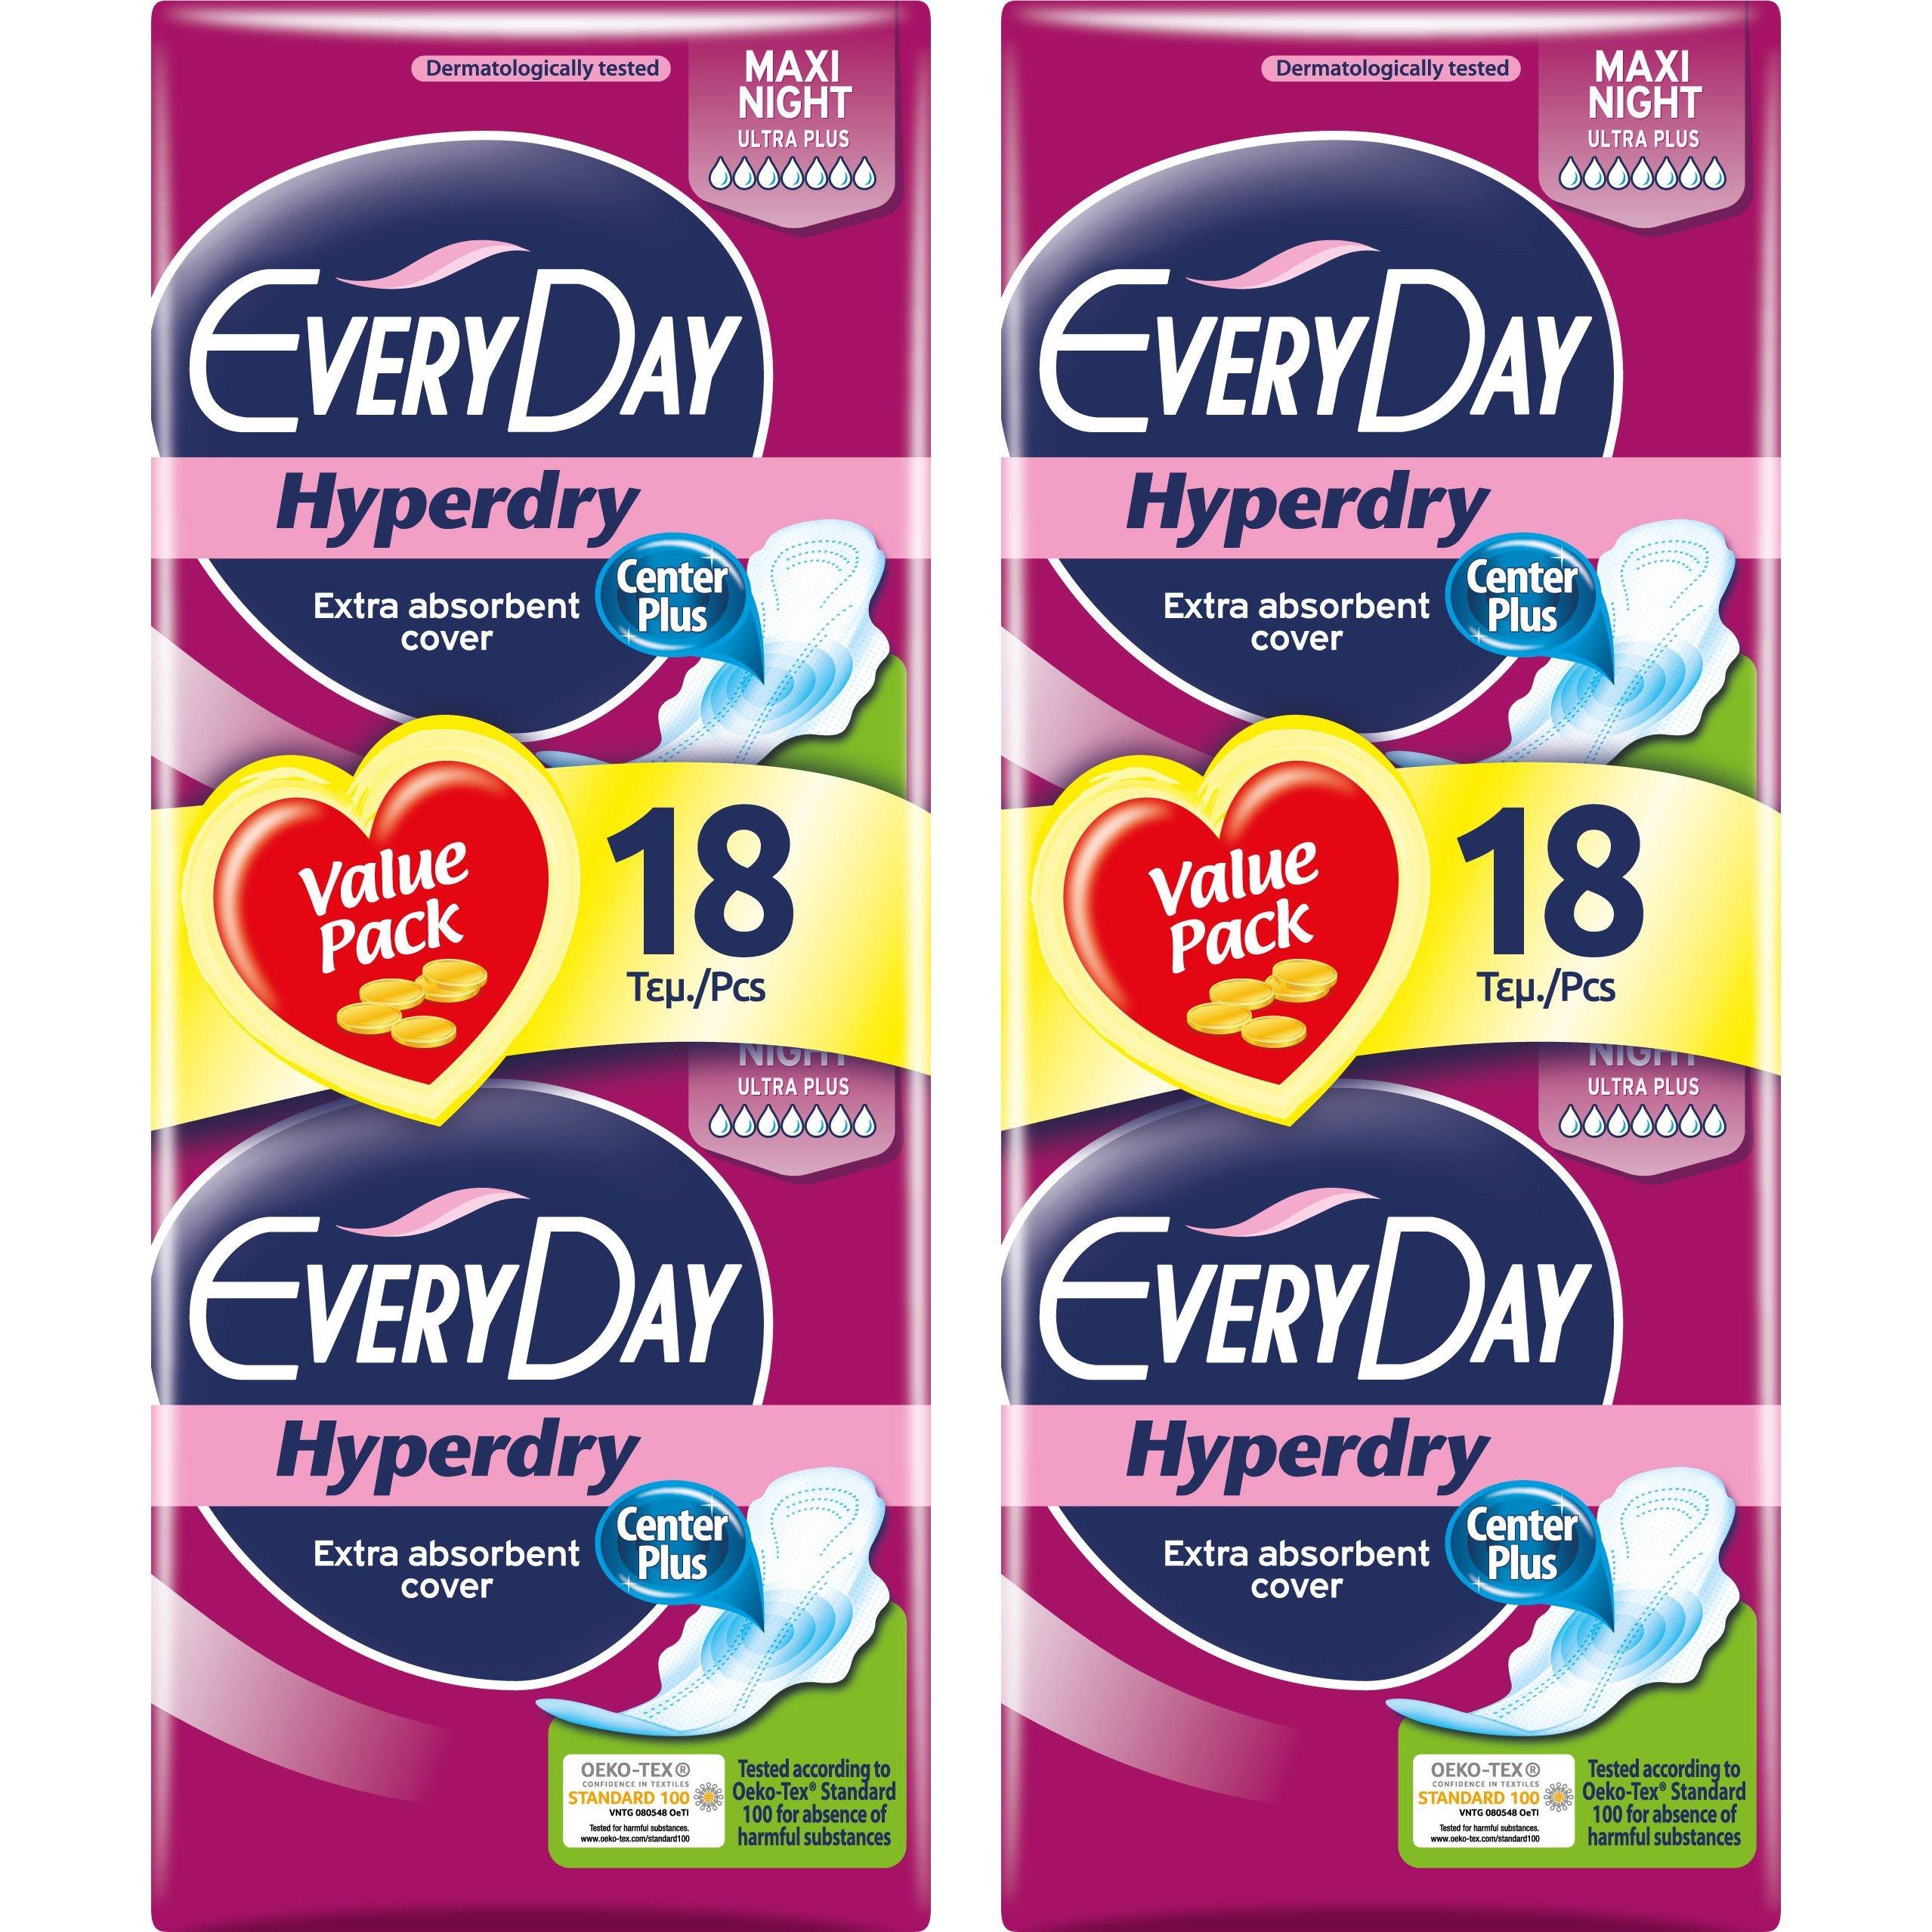 Every Day Πακέτο Προσφοράς Hyperdry Maxi Night Value Pack Σερβιέτες Ιδανικές για τη Νύχτα 2×18 Τεμάχια 1+1 Δώρο